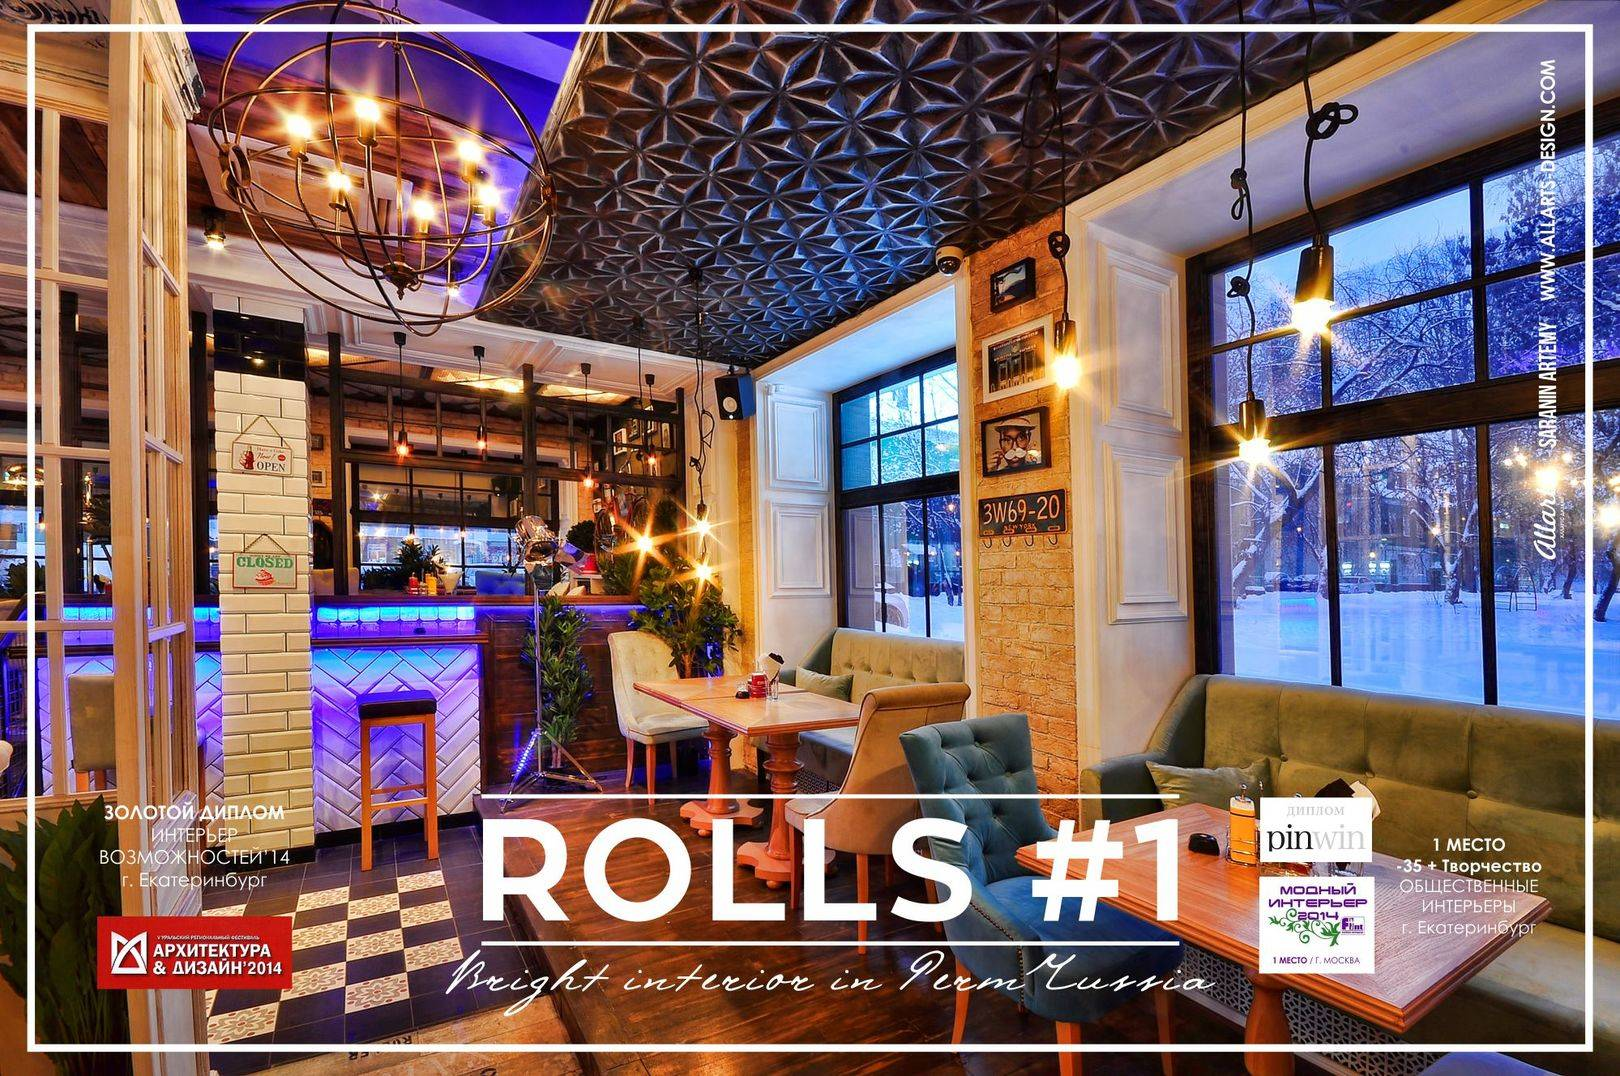 Дизайн интерьера кафе Rollszakamsk